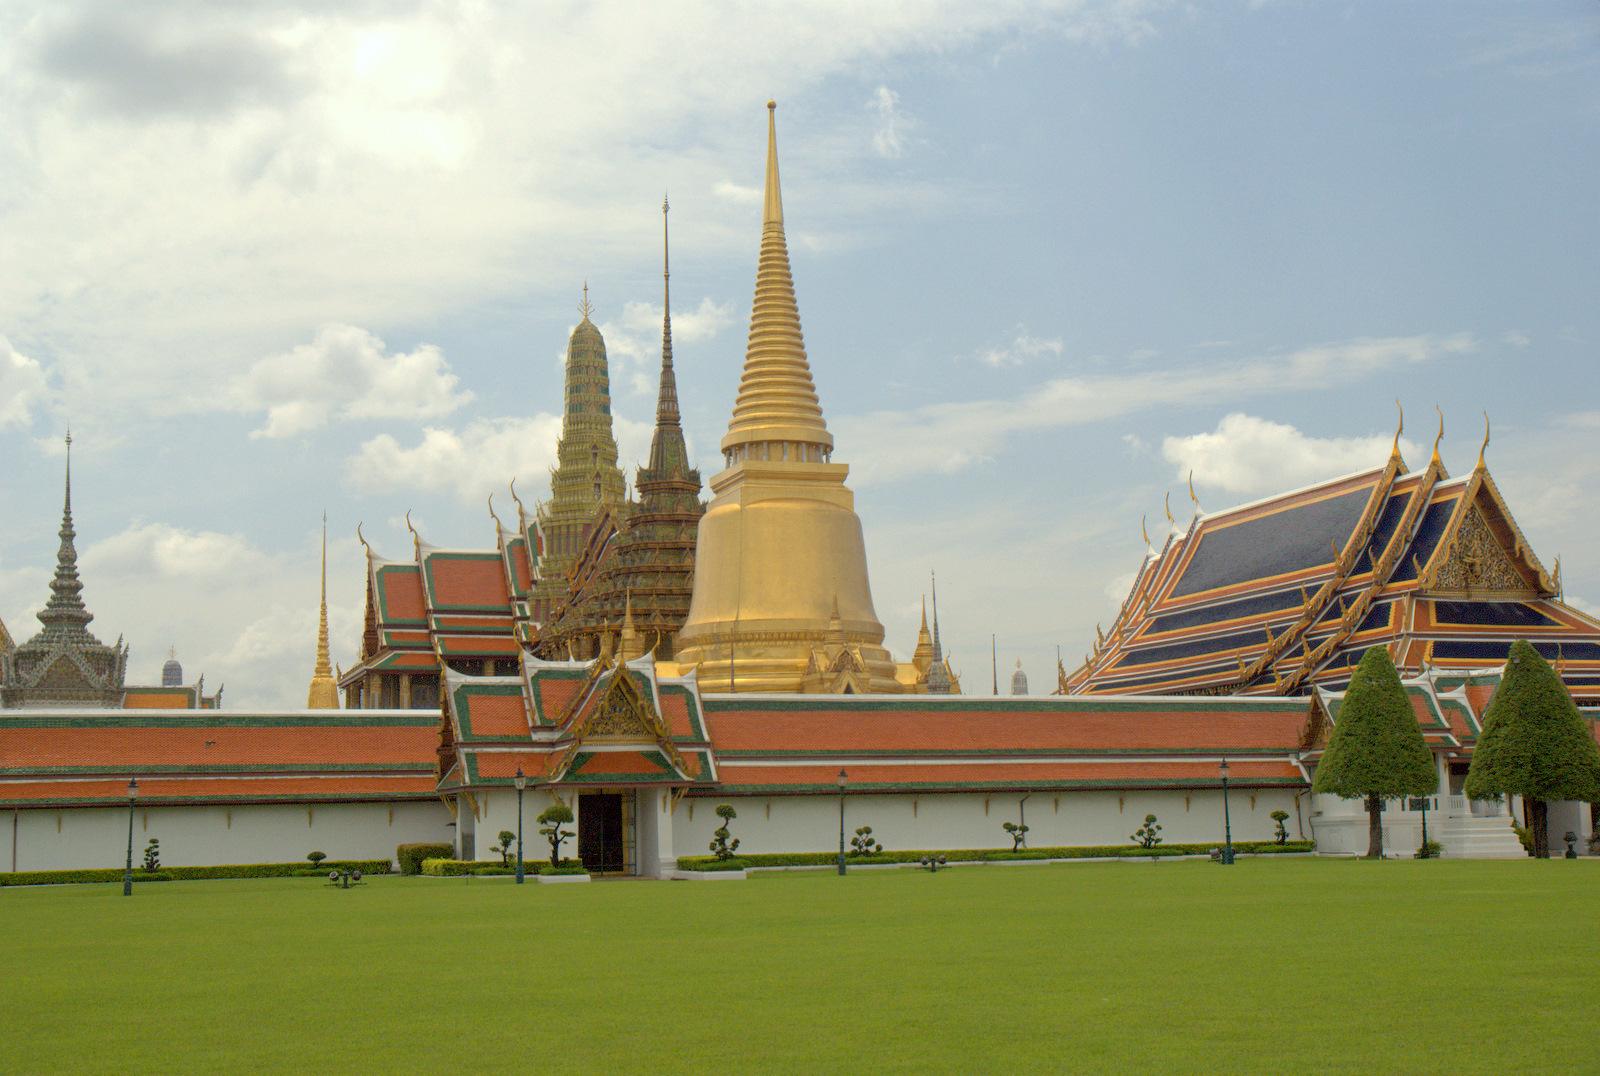 Bangkok (ostatni spacer autobusem i rzeką) 10